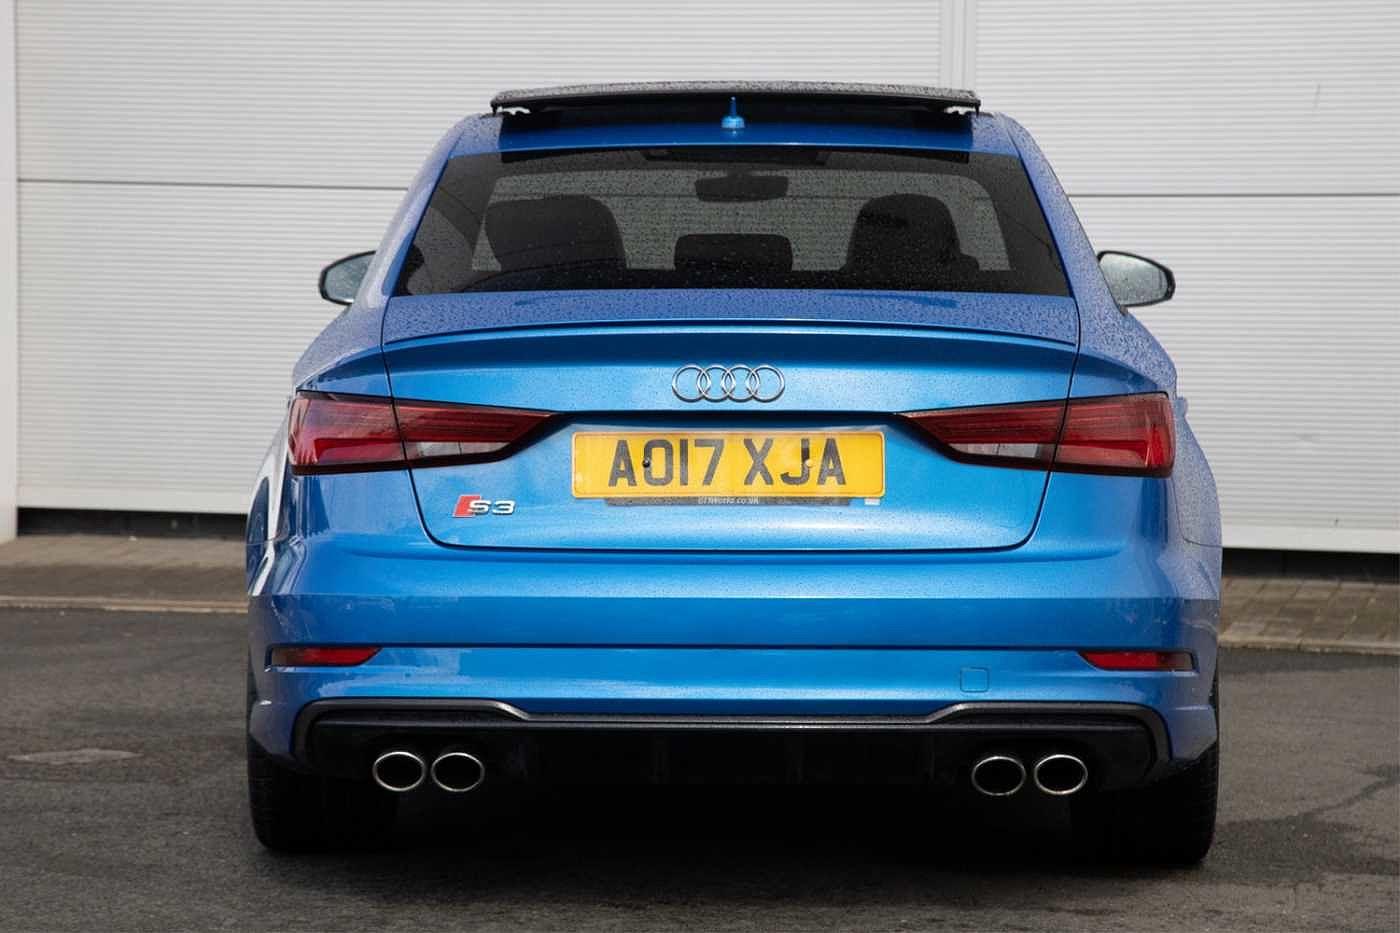 Used 2017 Audi S3 in Ara Blue for Sale in Edinburgh, only ...